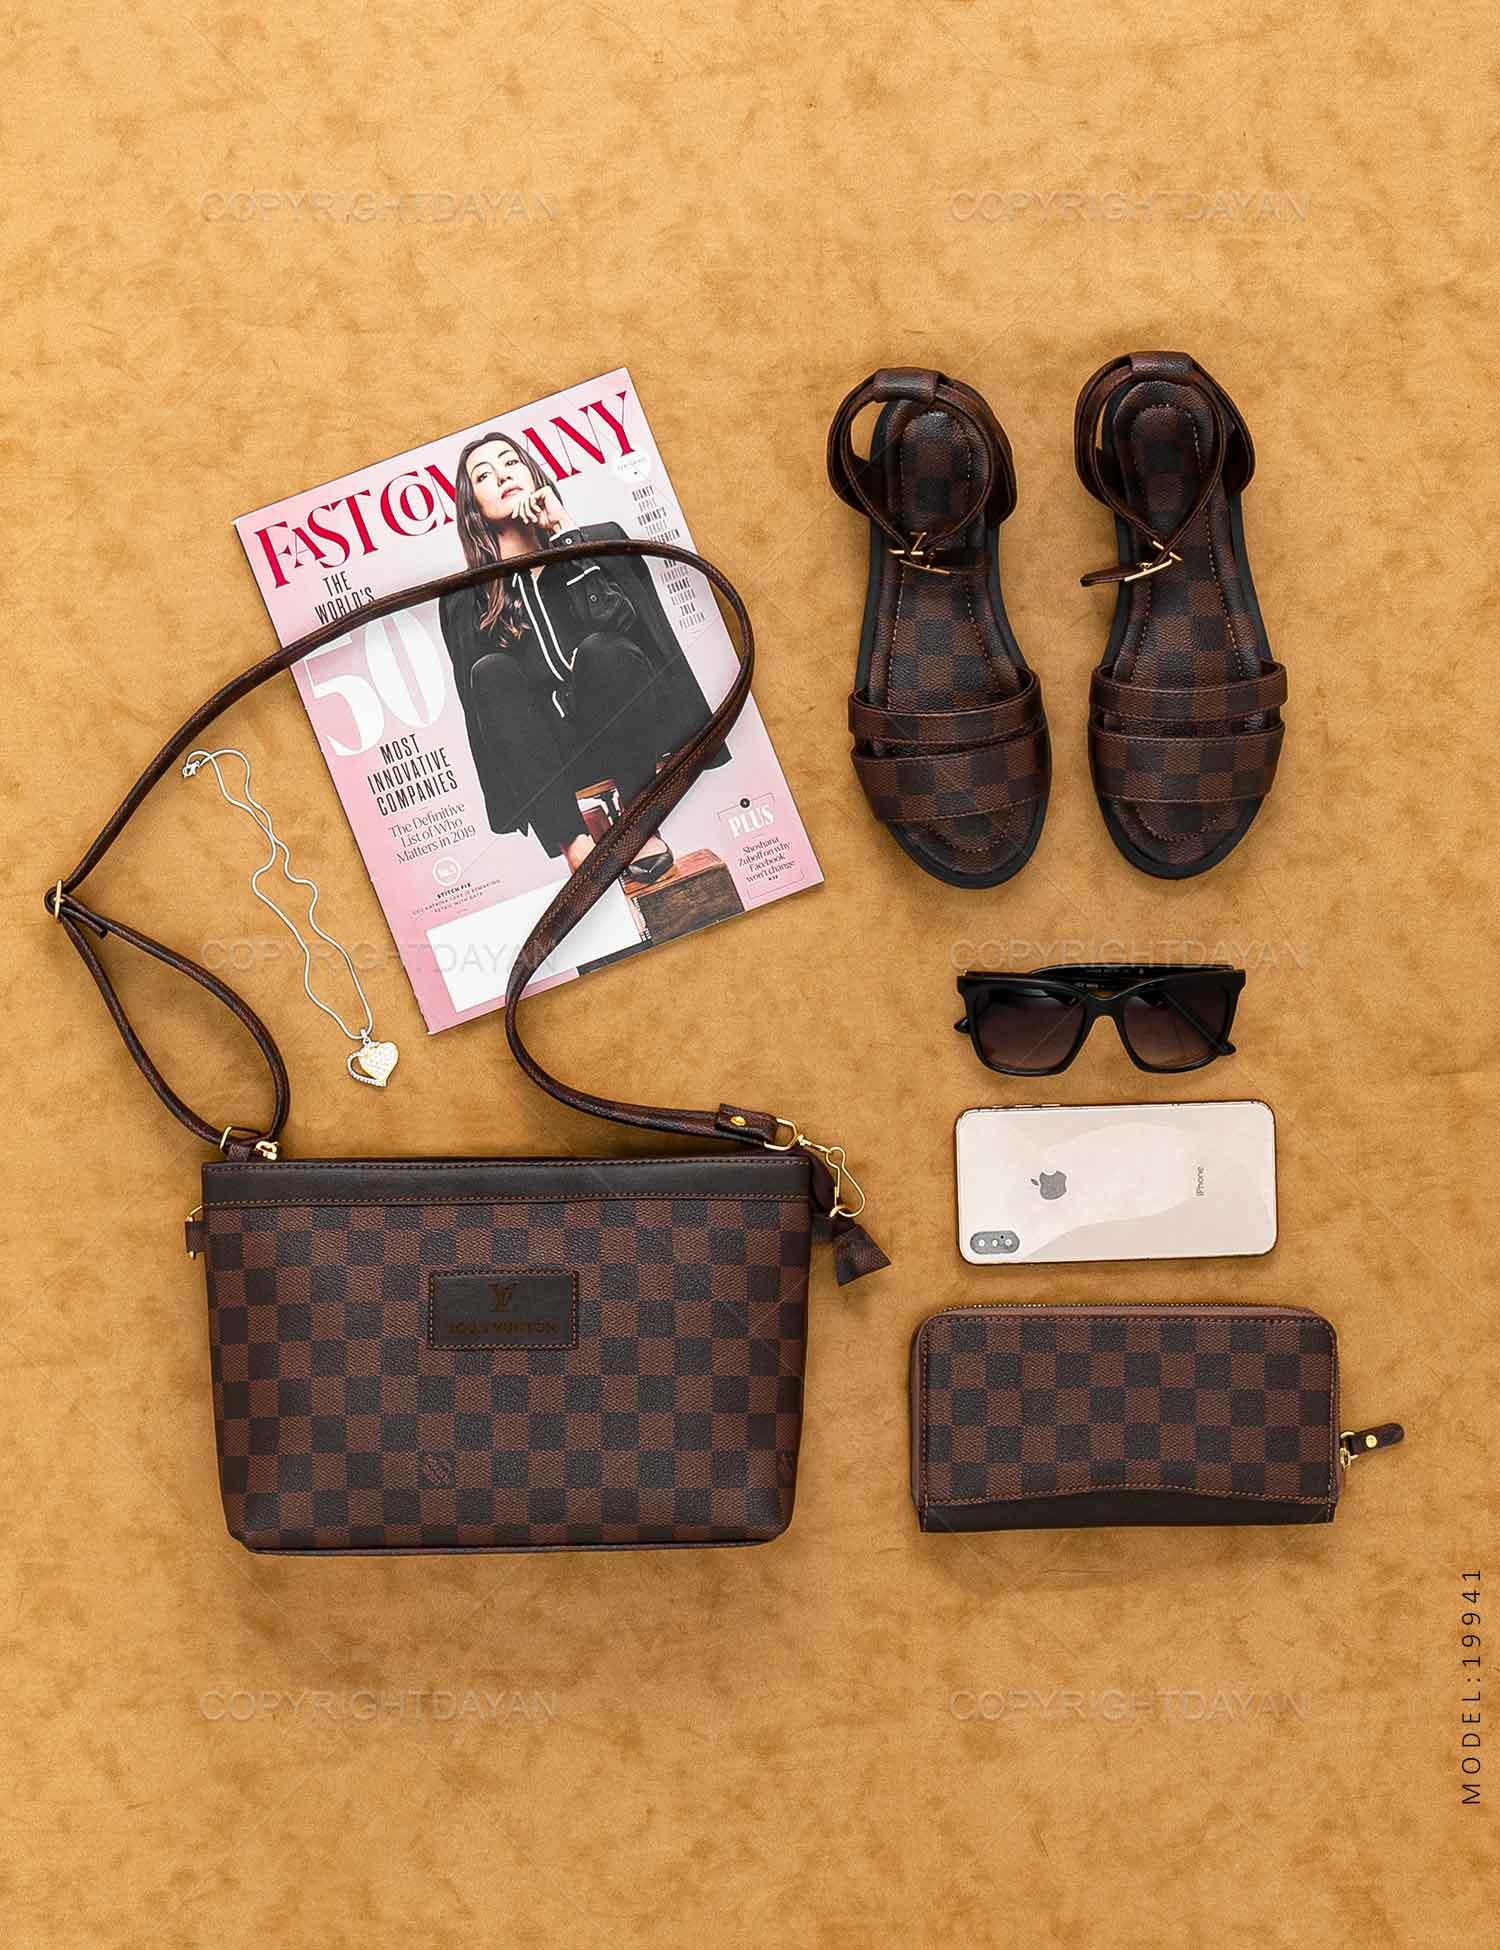 ست سه تیکه زنانه Louis Vuitton مدل 19941 ست سه تیکه زنانه Louis Vuitton مدل 19941 199,000 تومان تومان